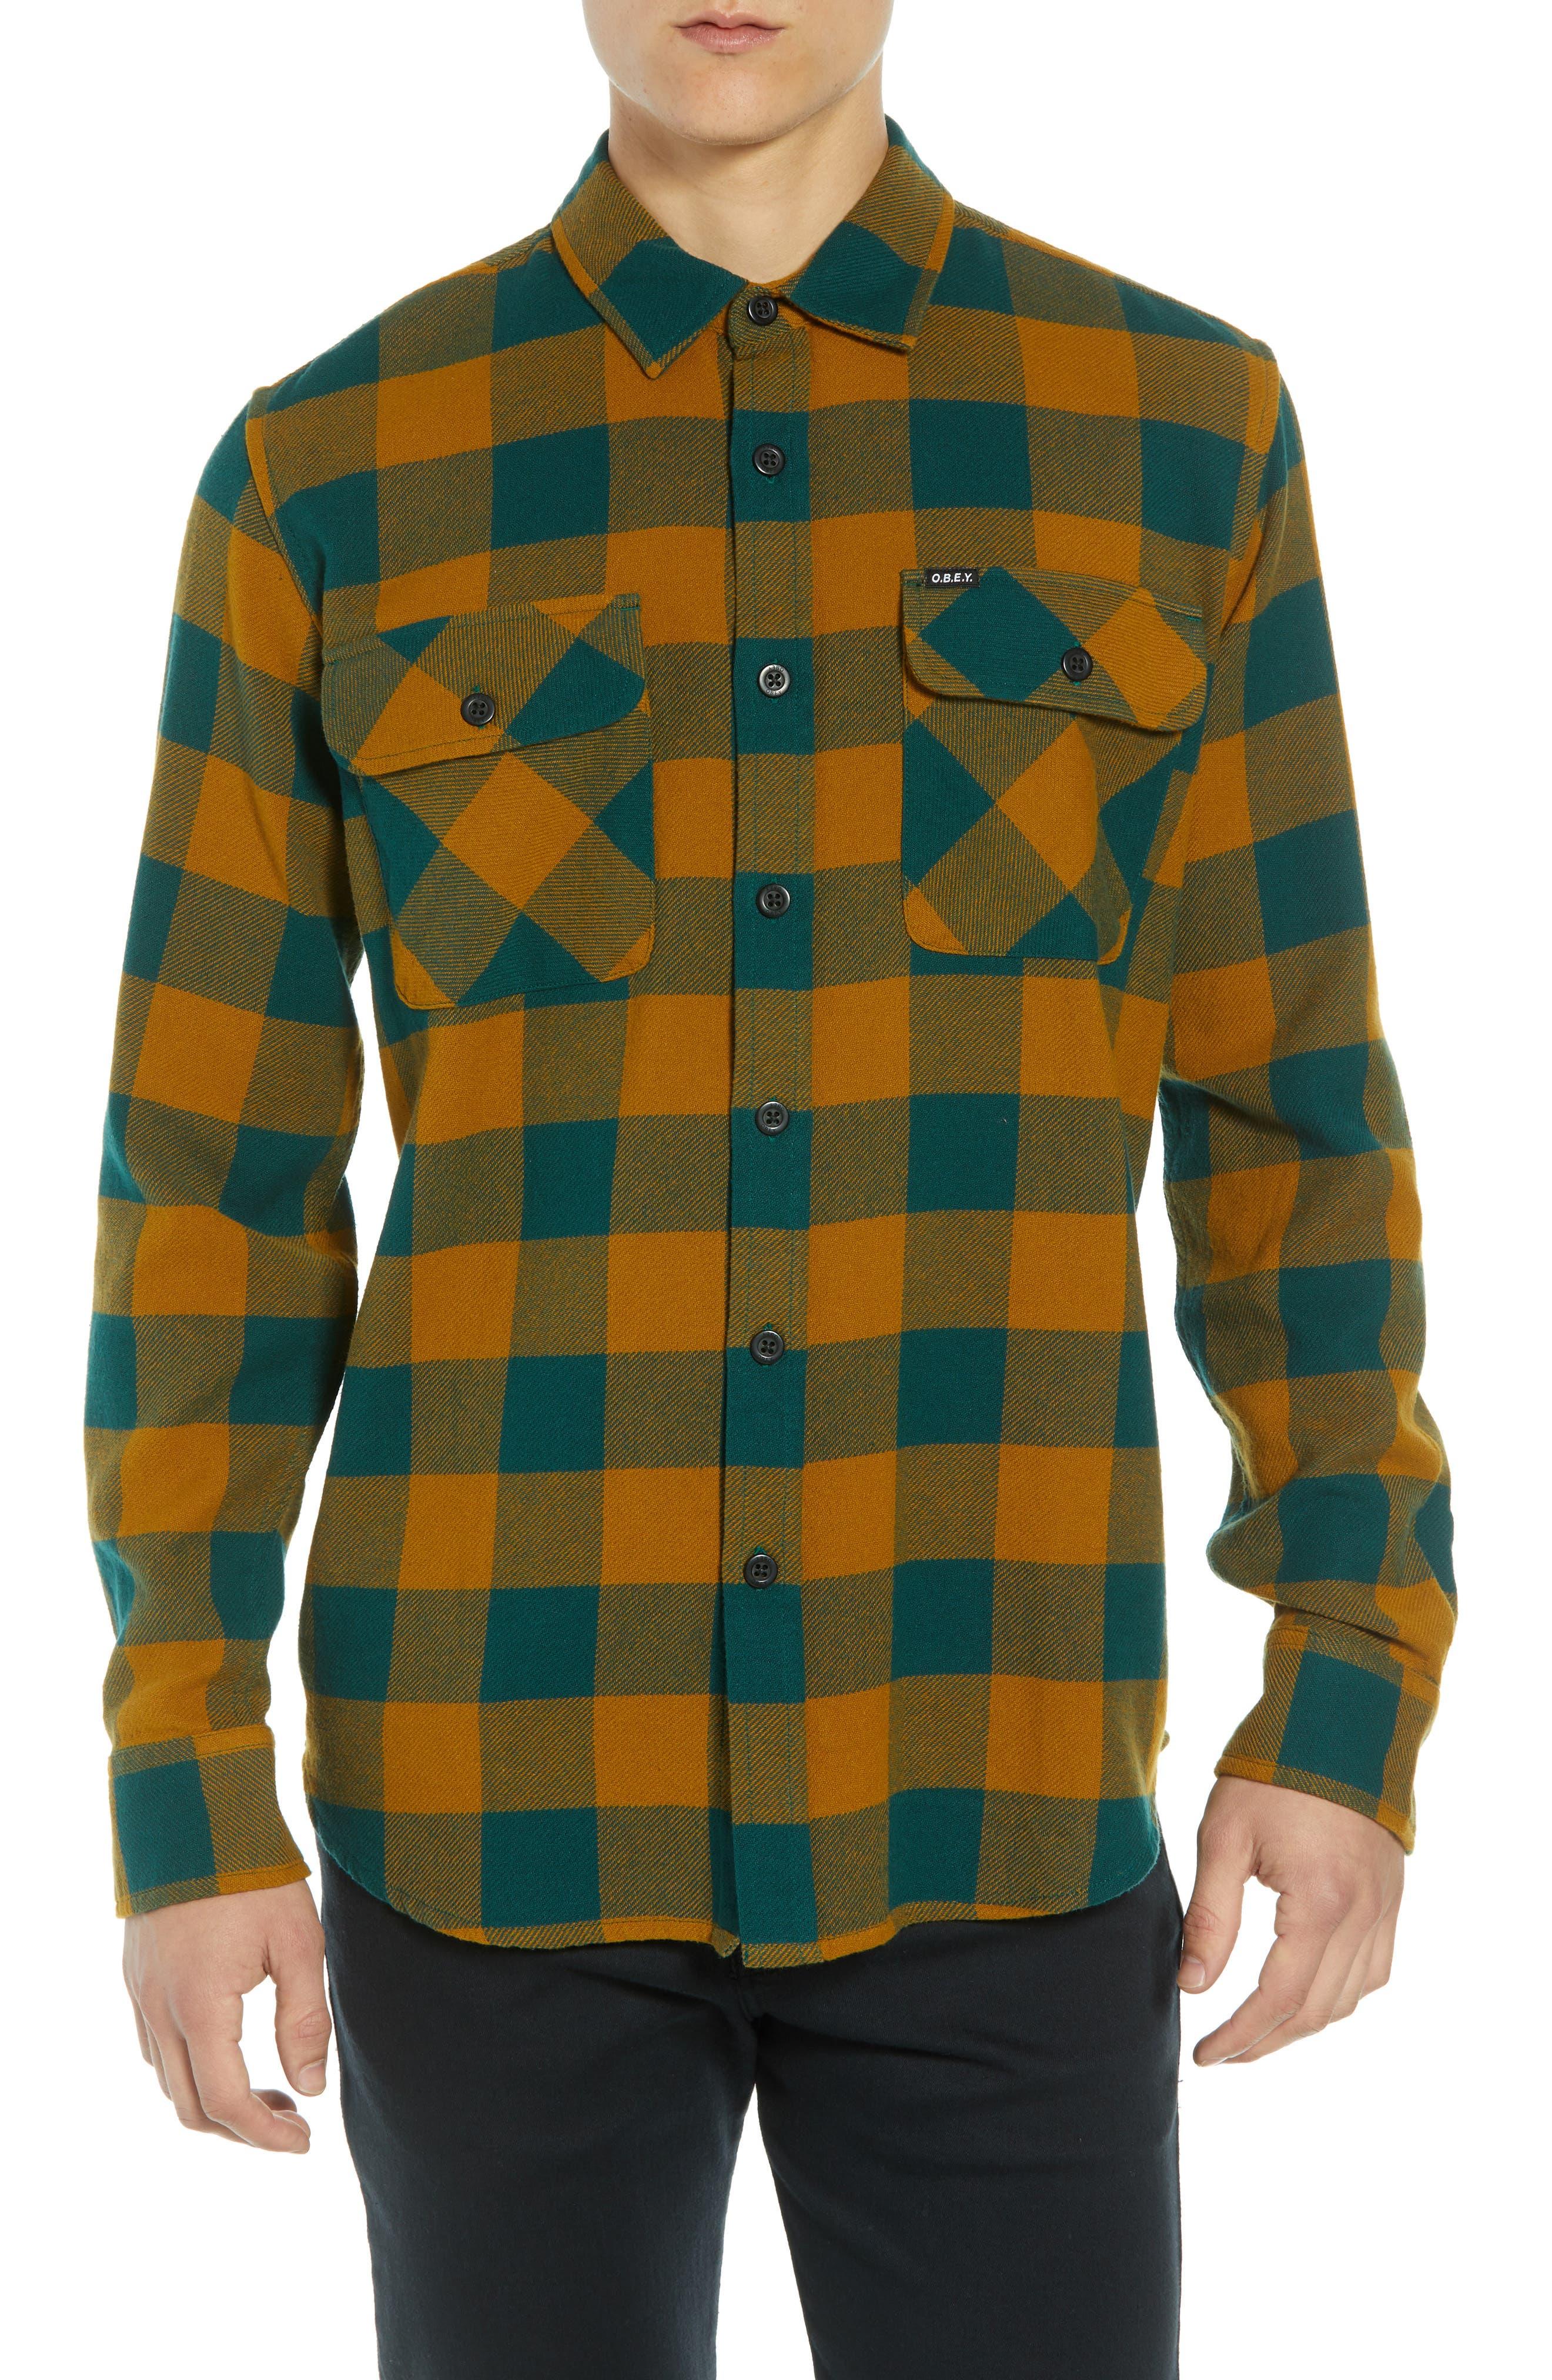 Vedder Buffalo Plaid Flannel Shirt,                         Main,                         color, DARK TEAL MULTI